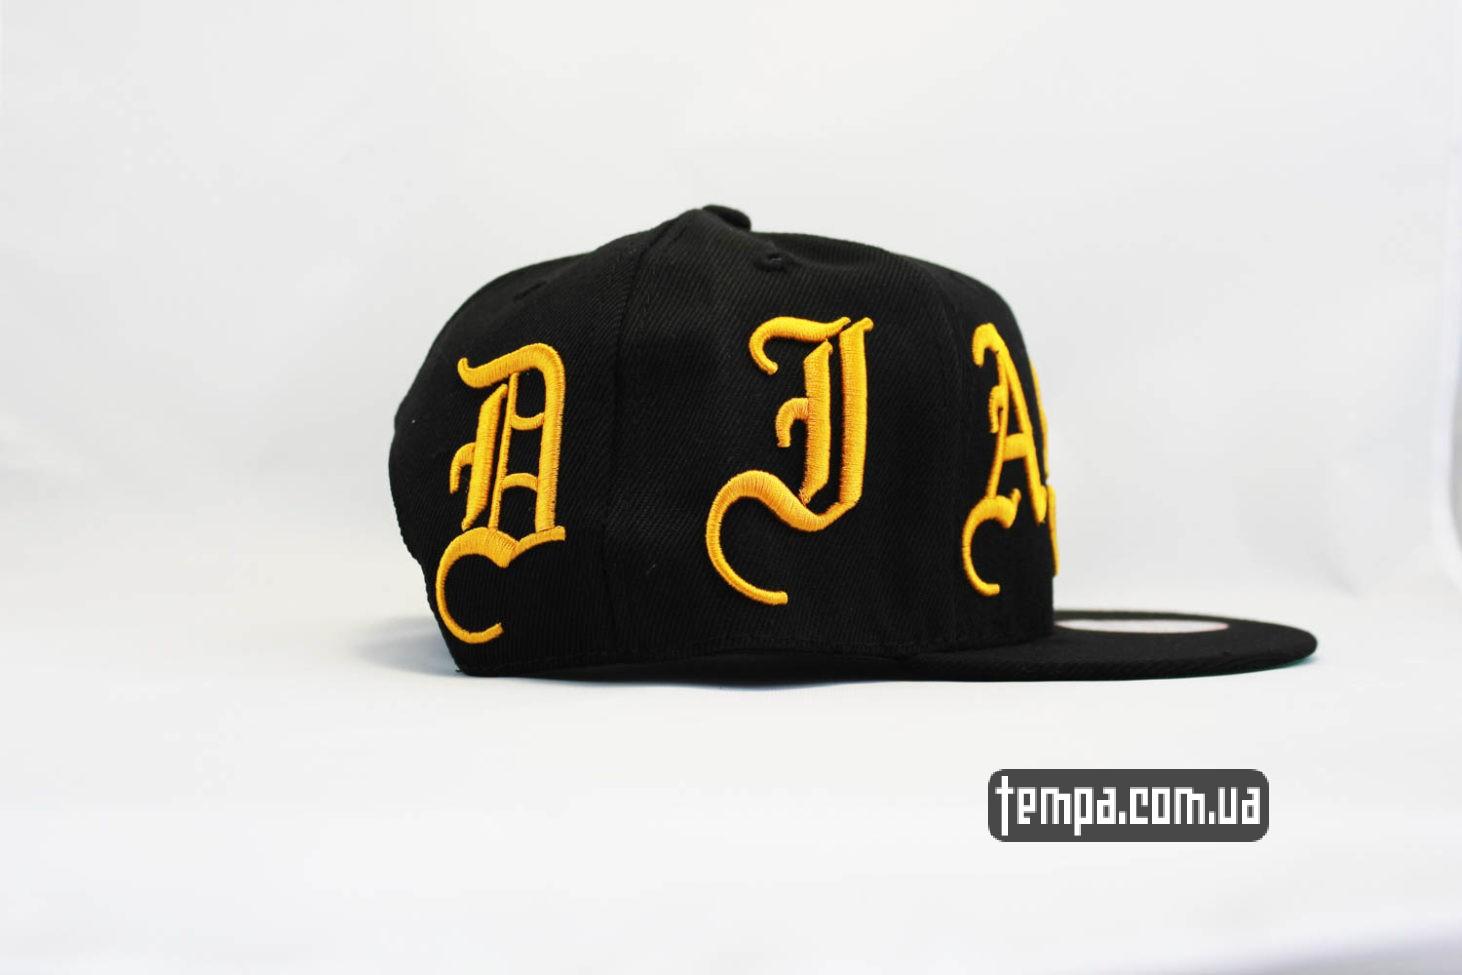 ганстерская одежда кепка snapback DIAMOND Ghetto Gangter черная